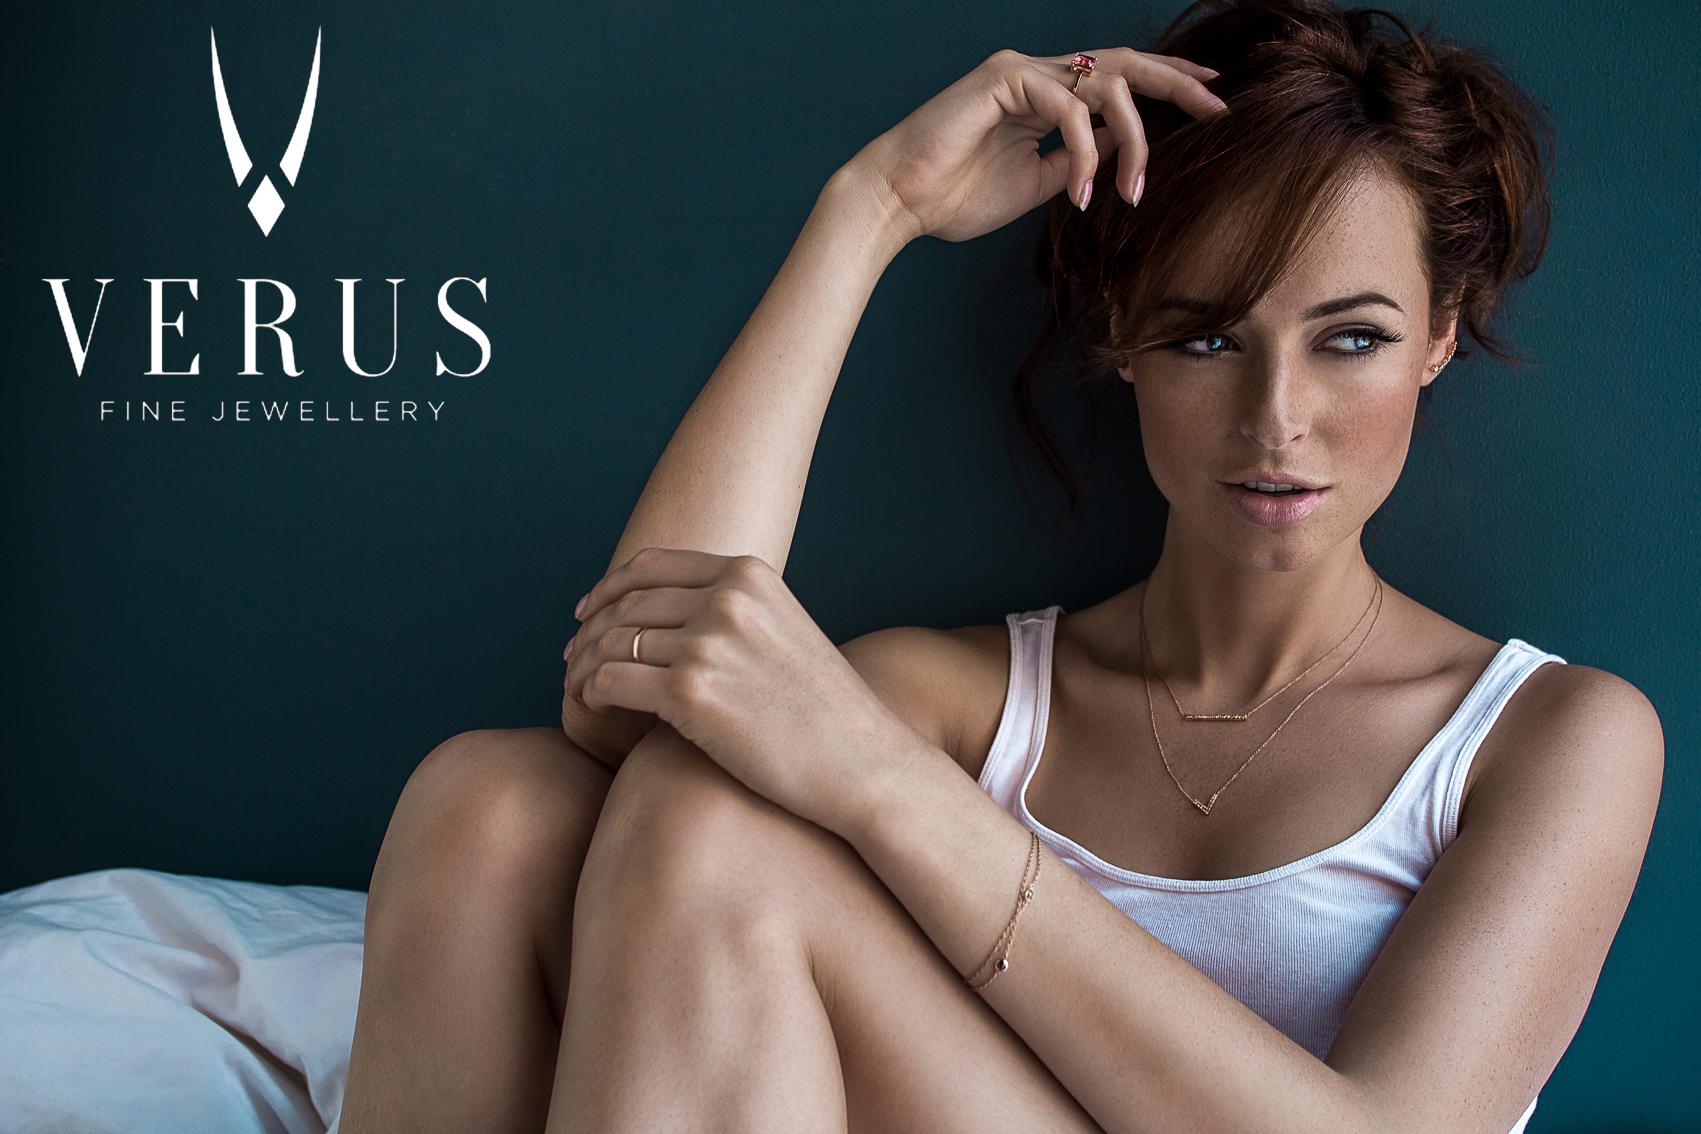 Verus - Editorial Campaign